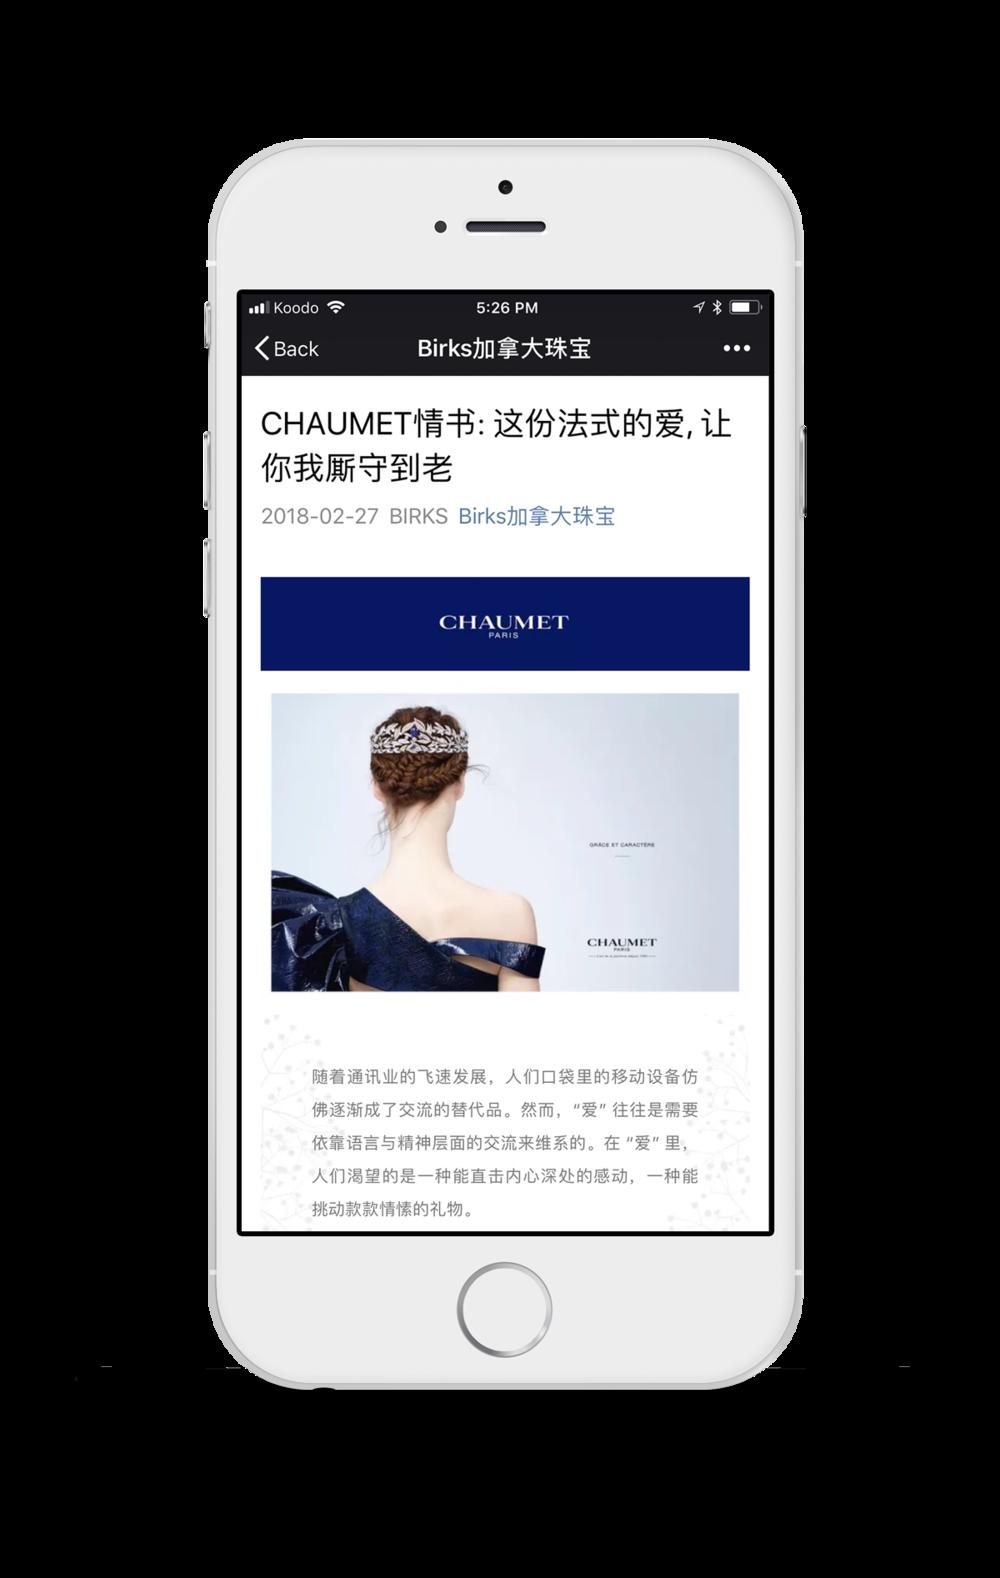 Birks-Chaumet-WeChat-Screenshot.png